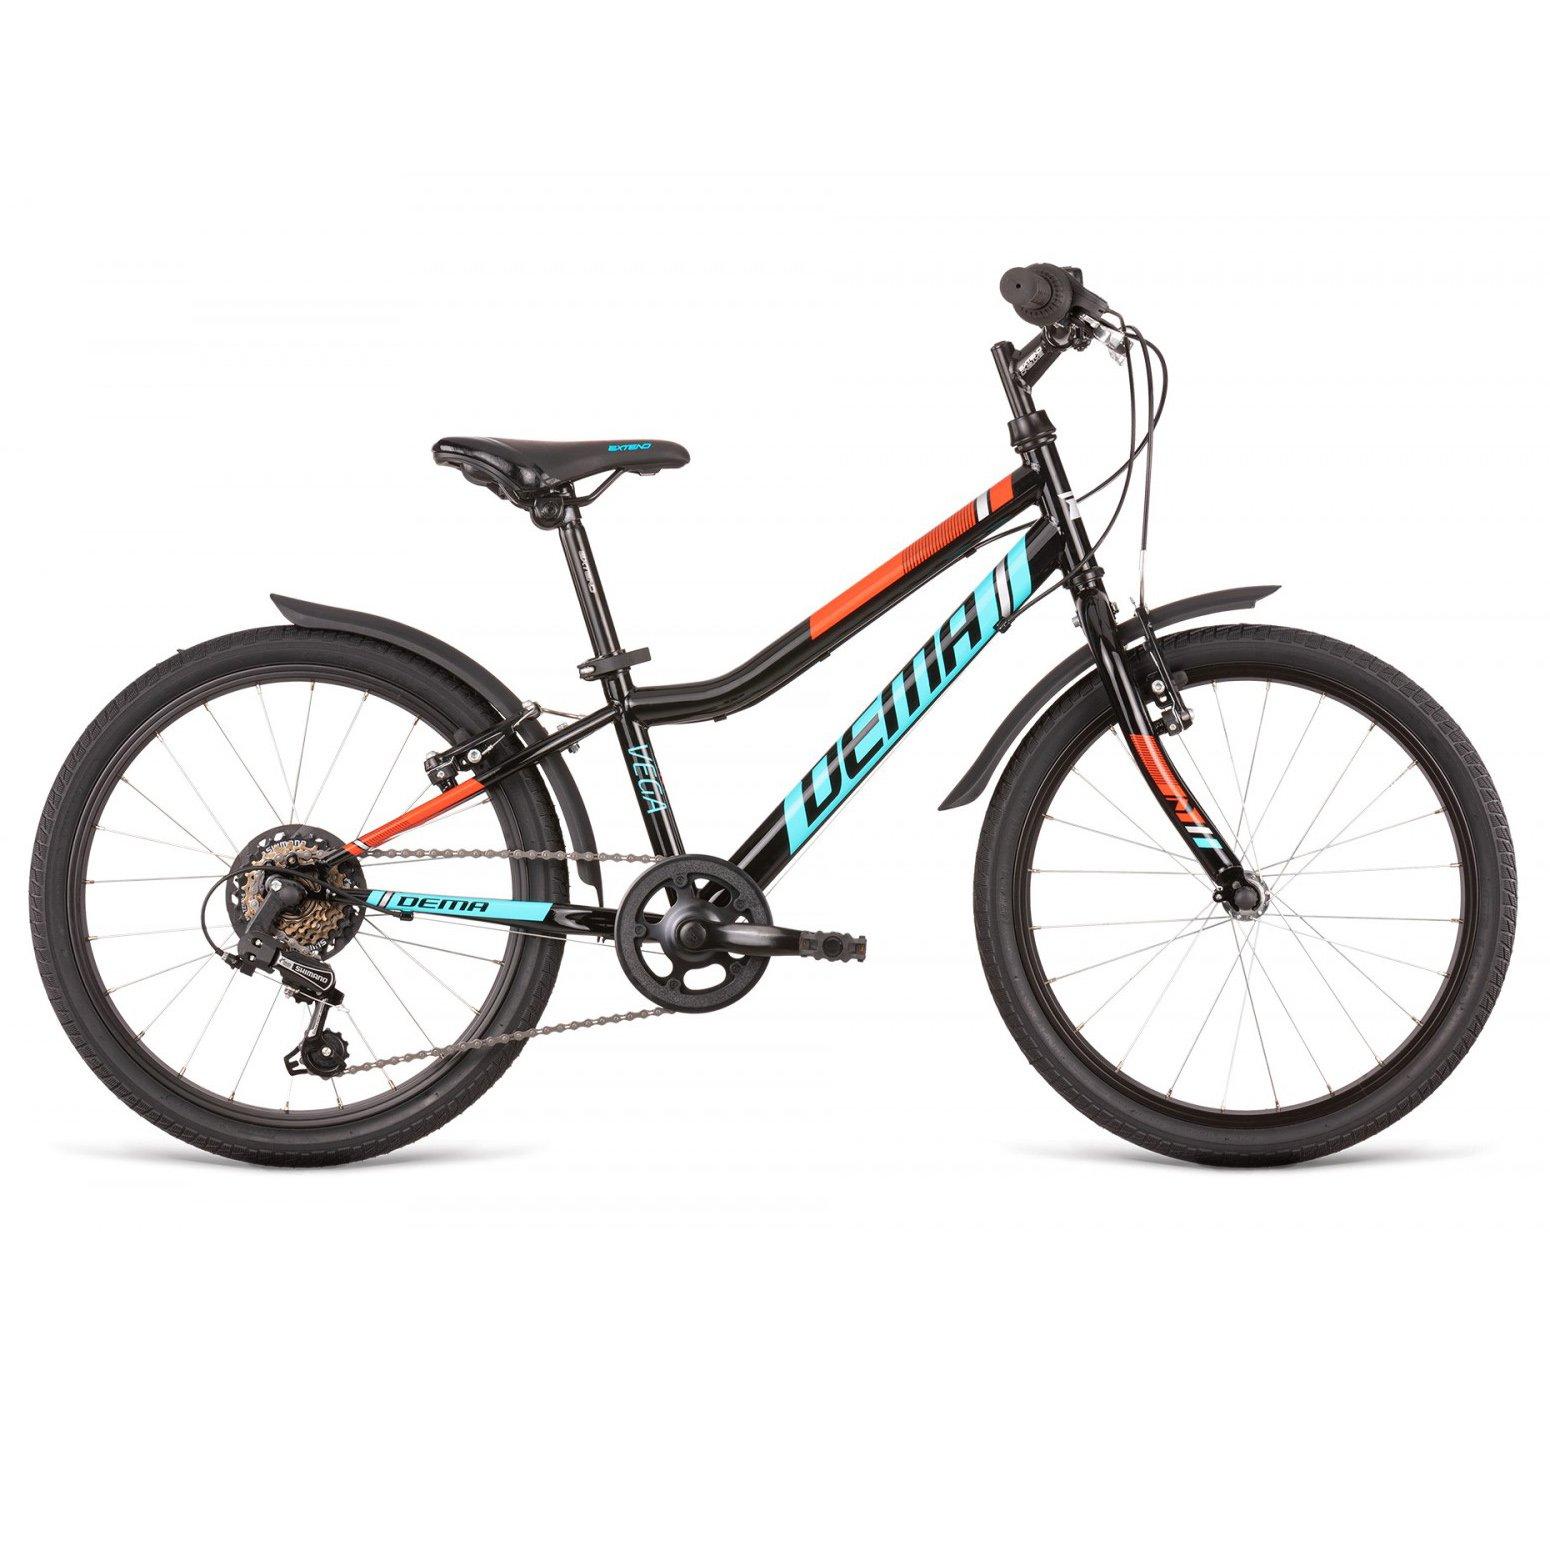 "Bērnu velosipēds Dema Vega 6 sp 20"""